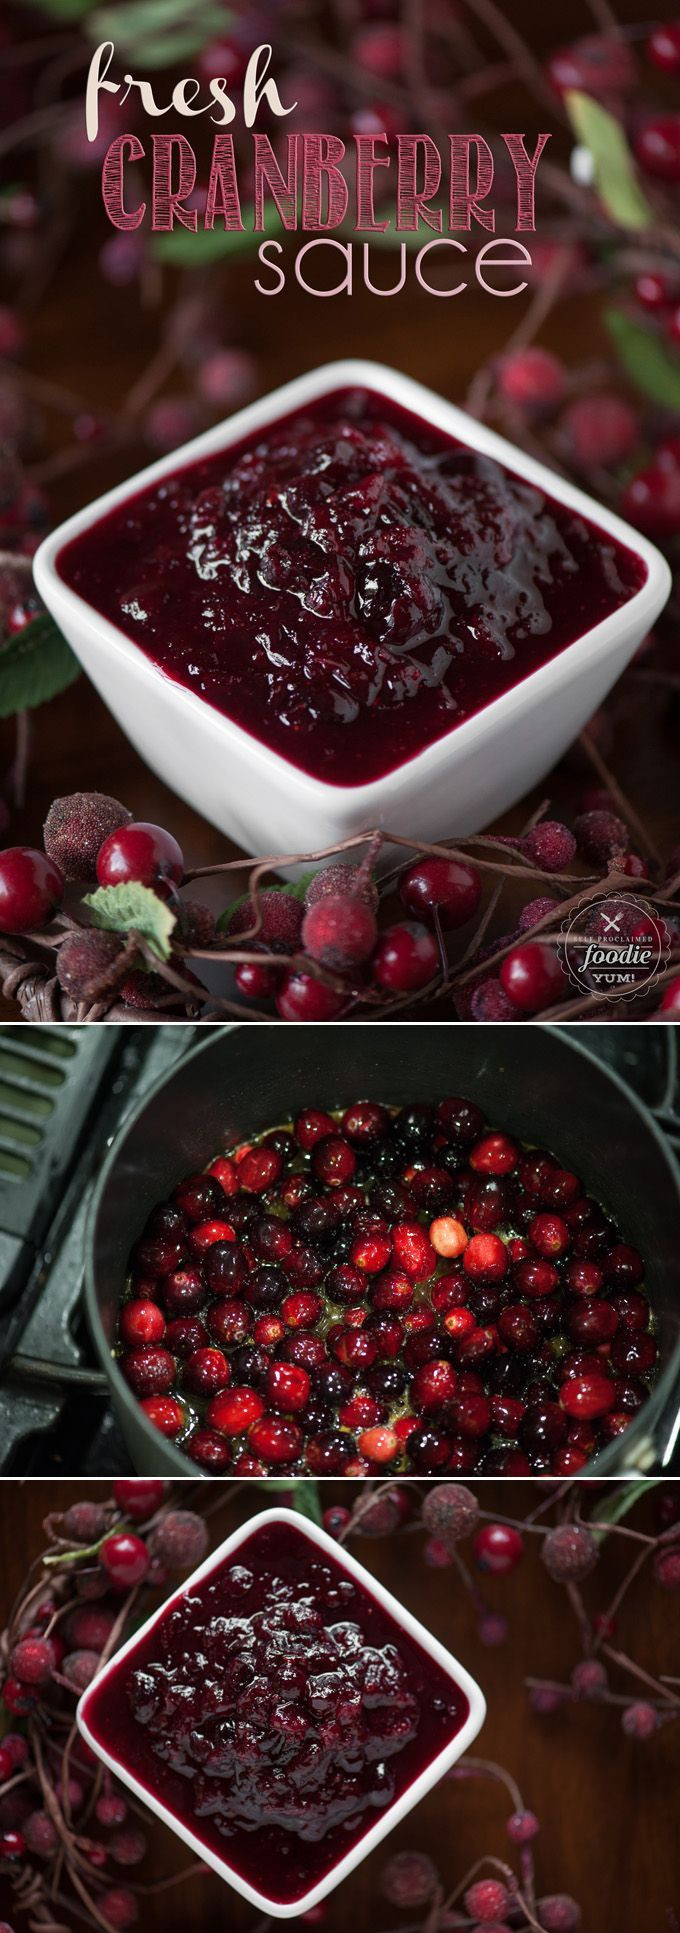 Best Cranberry Recipes Thanksgiving  17 Best ideas about Cranberry Sauce on Pinterest